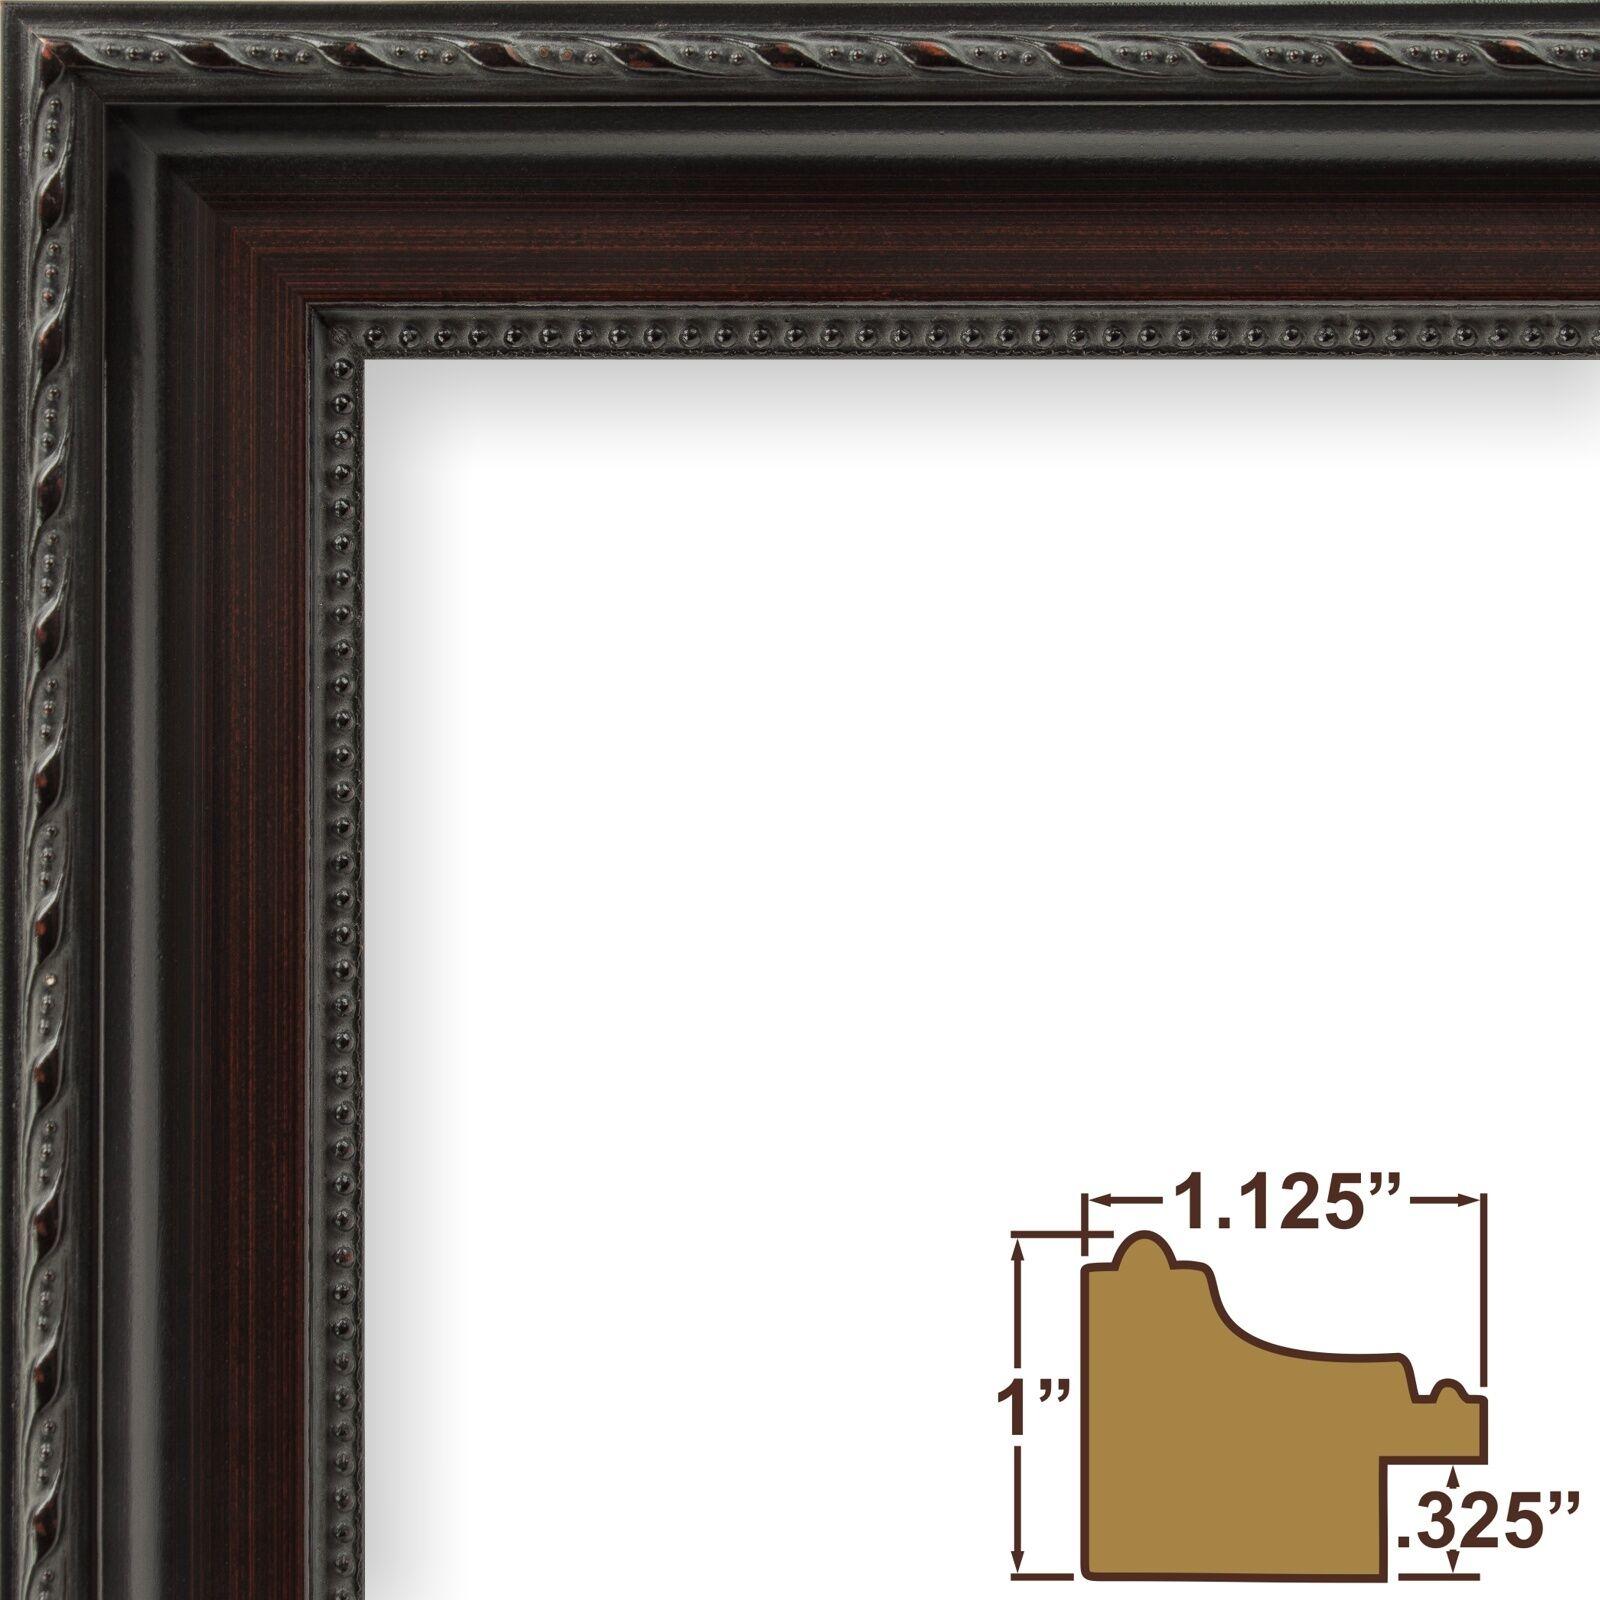 Craig frames annesbury queen ann dark walnut brown picture frame 1 picture 1 of 10 jeuxipadfo Gallery